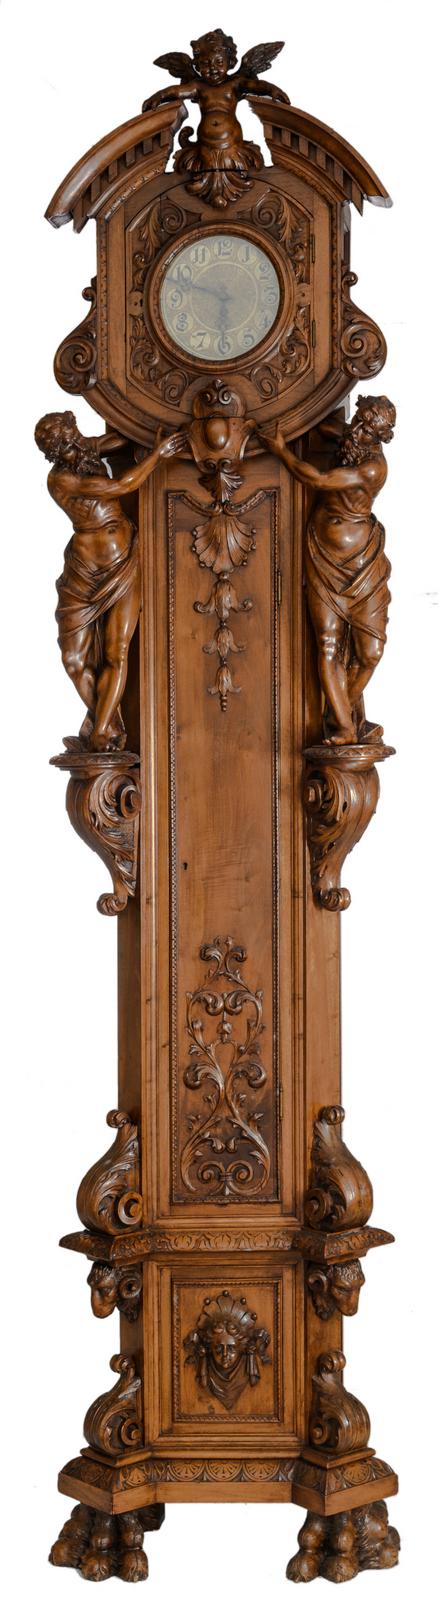 A fine Renaissance revival Italian walnut longcase clock,H 260 - W 63 - D 32 cm